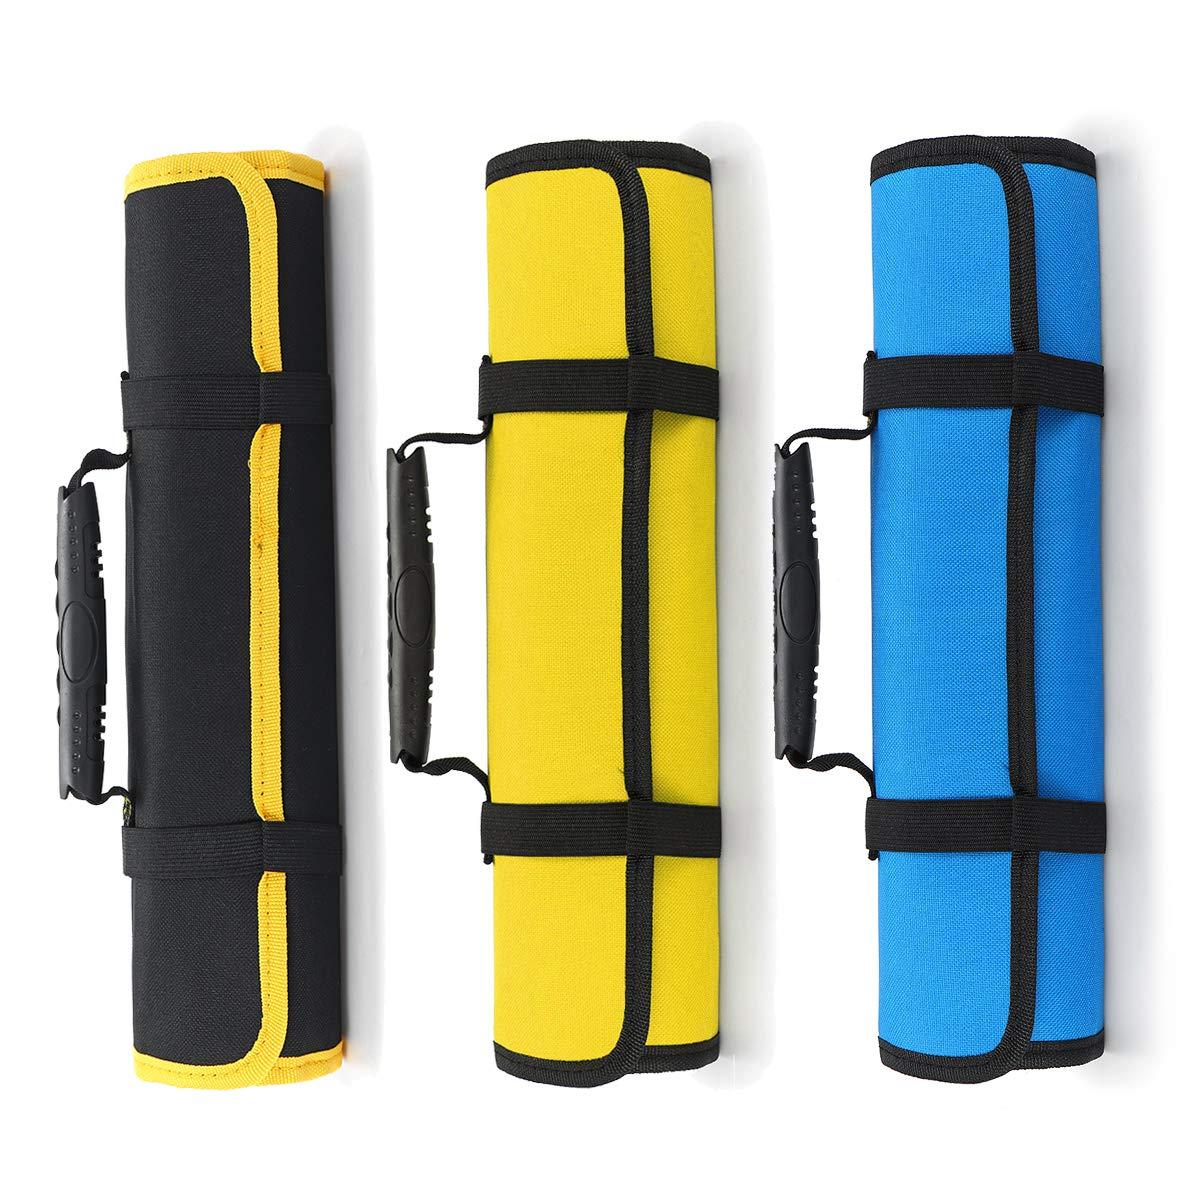 Tanchen Multipurposed Pocket Knife Roll Bag Tools Storage Polyester Holder Roll Bag Water-Proof